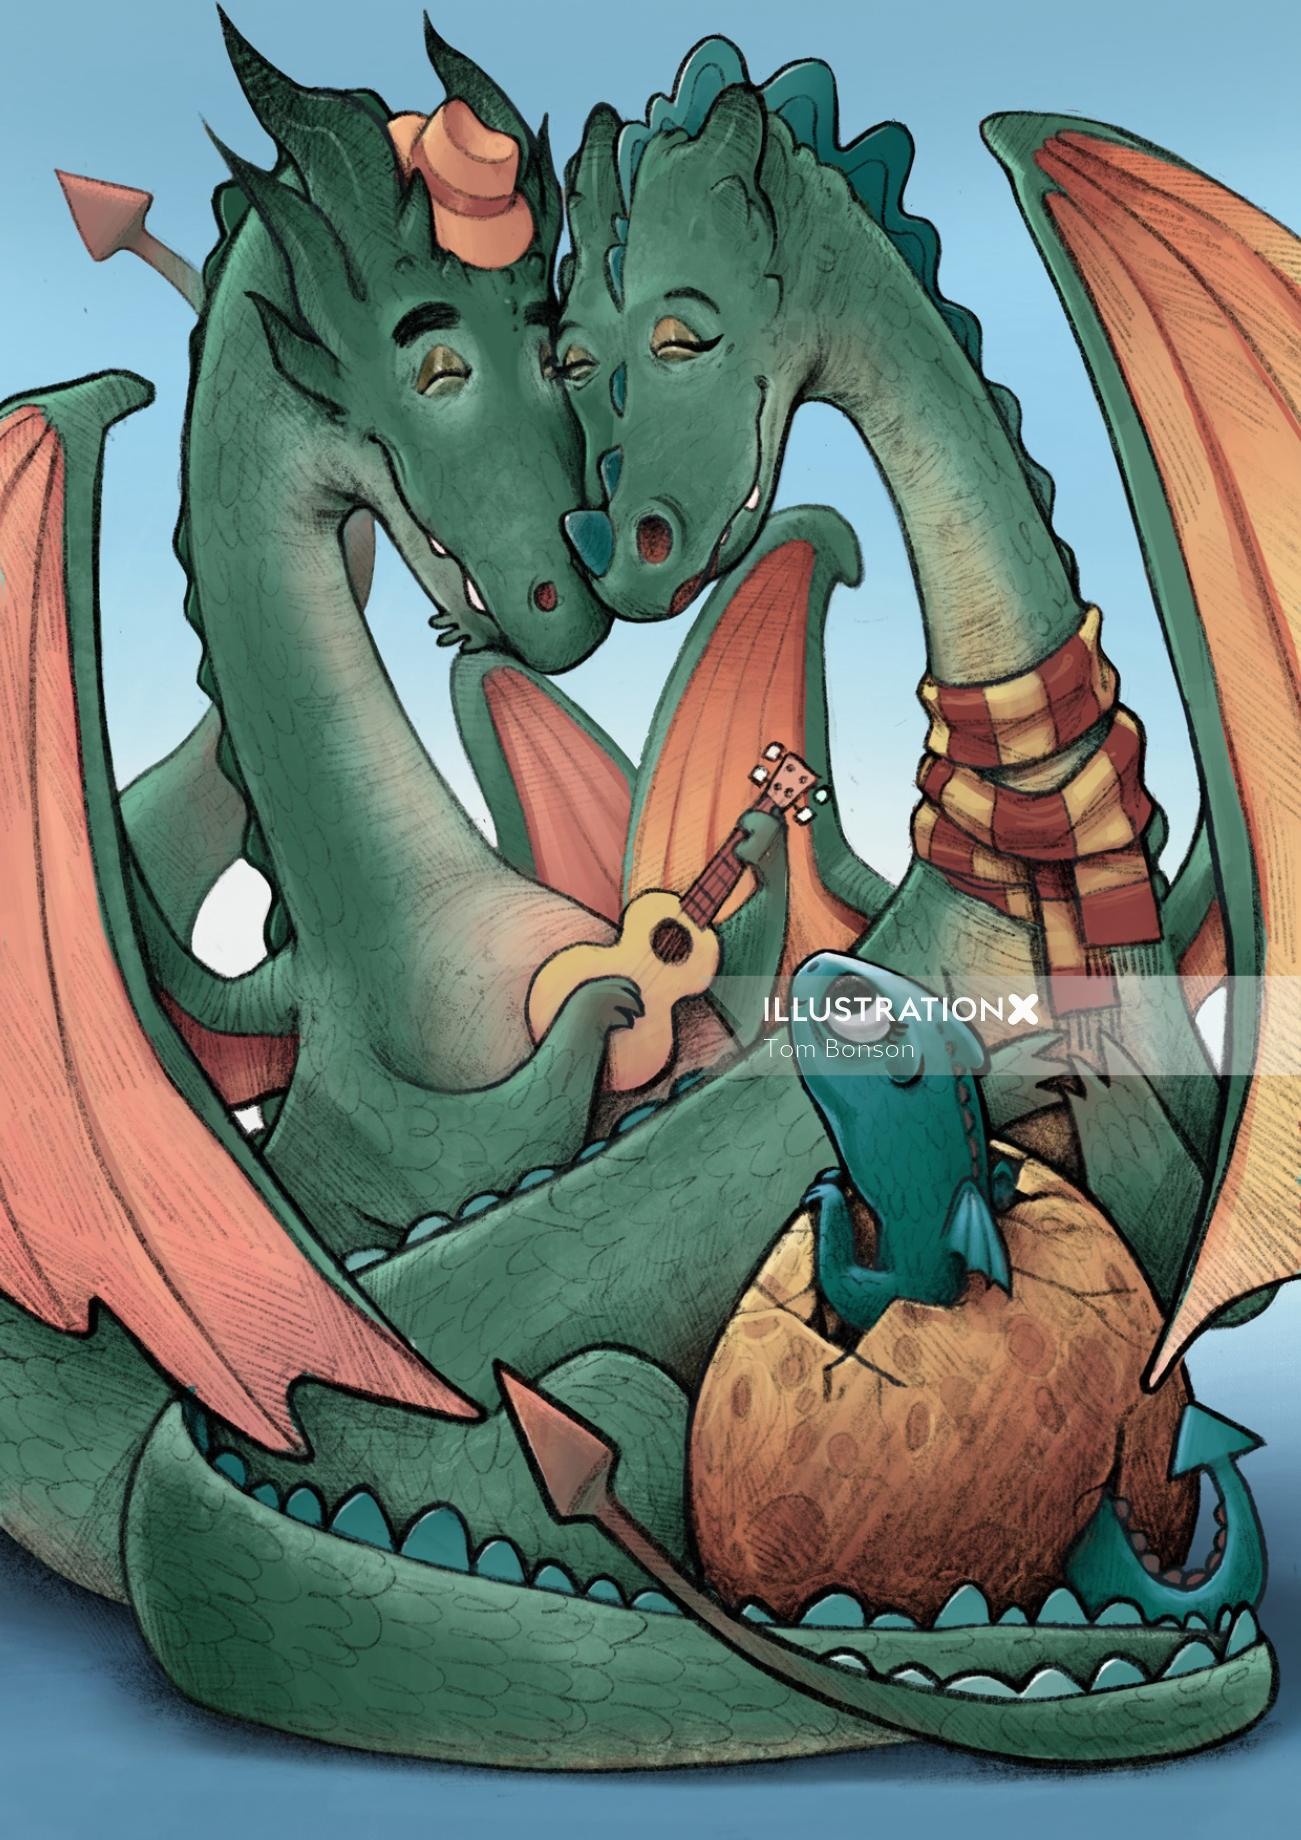 Fantasy illustration of Happy dragons